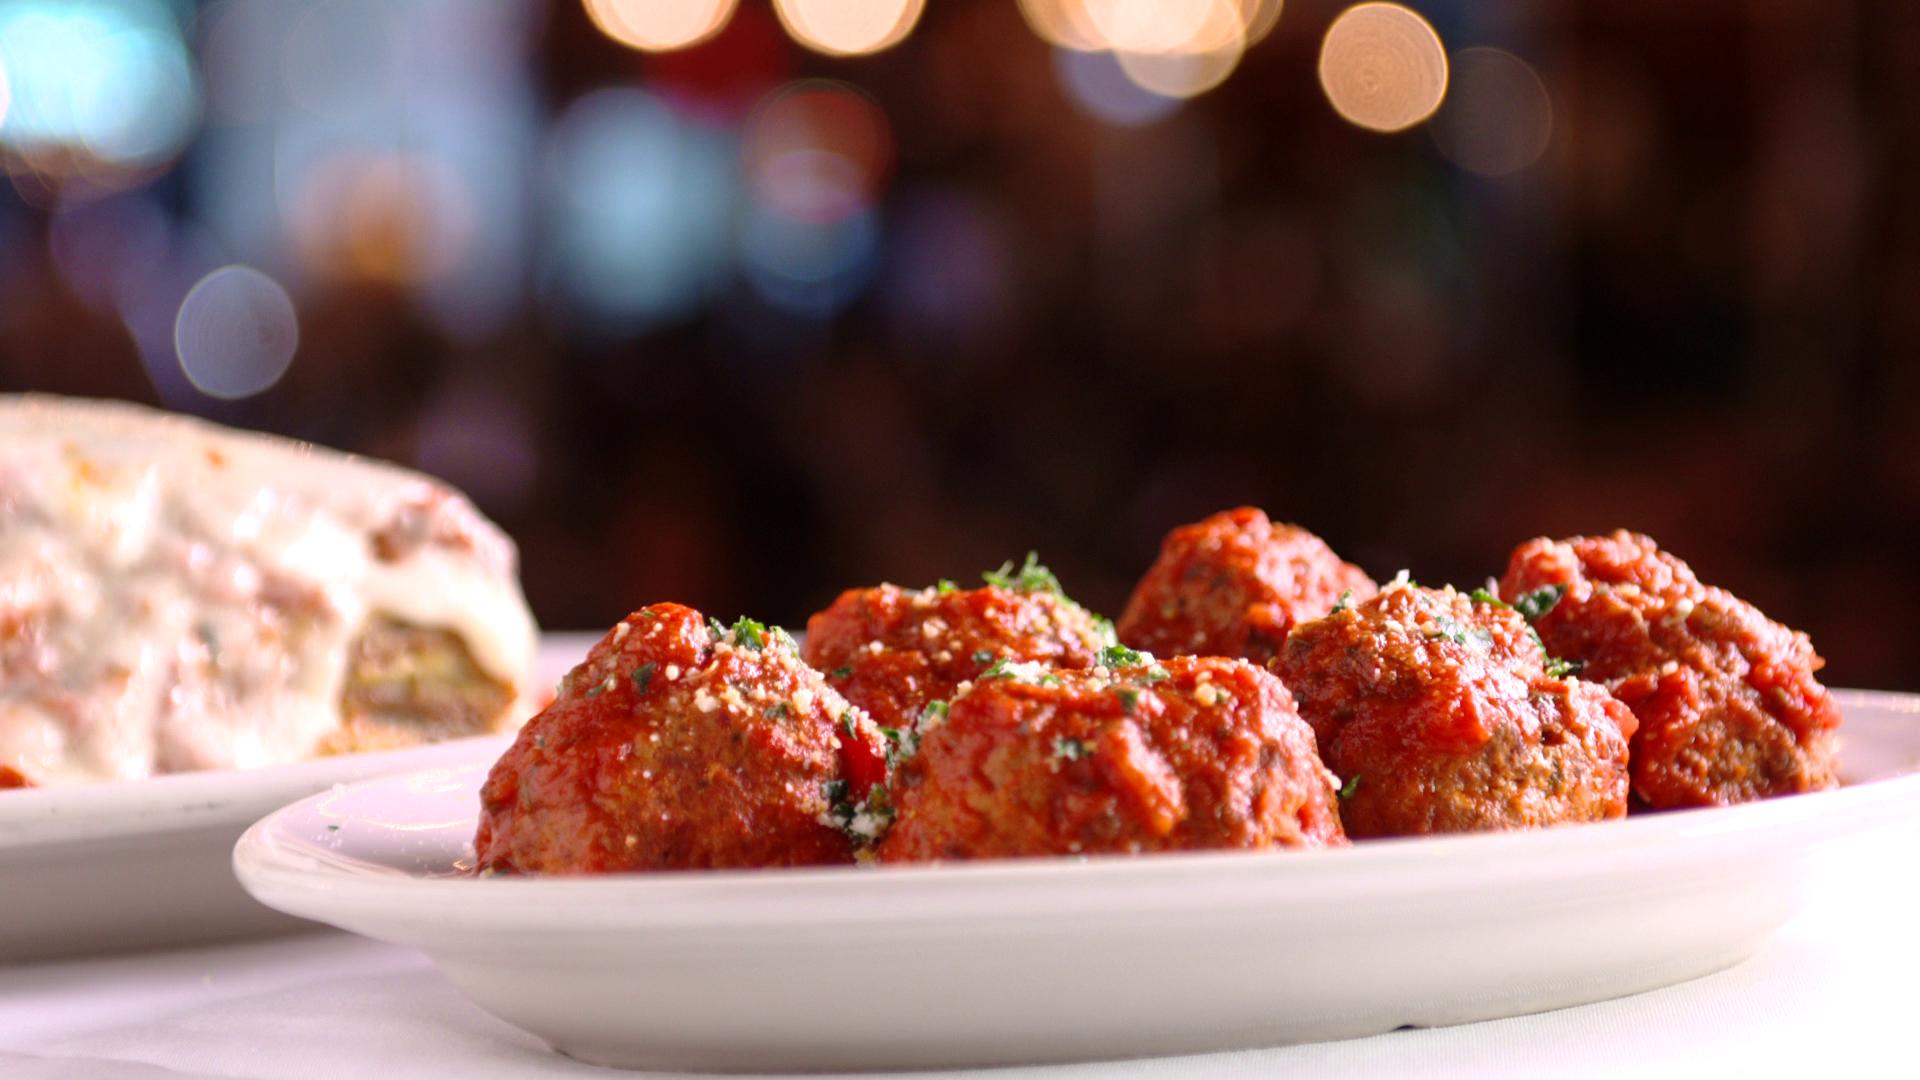 Carmine's meatballs